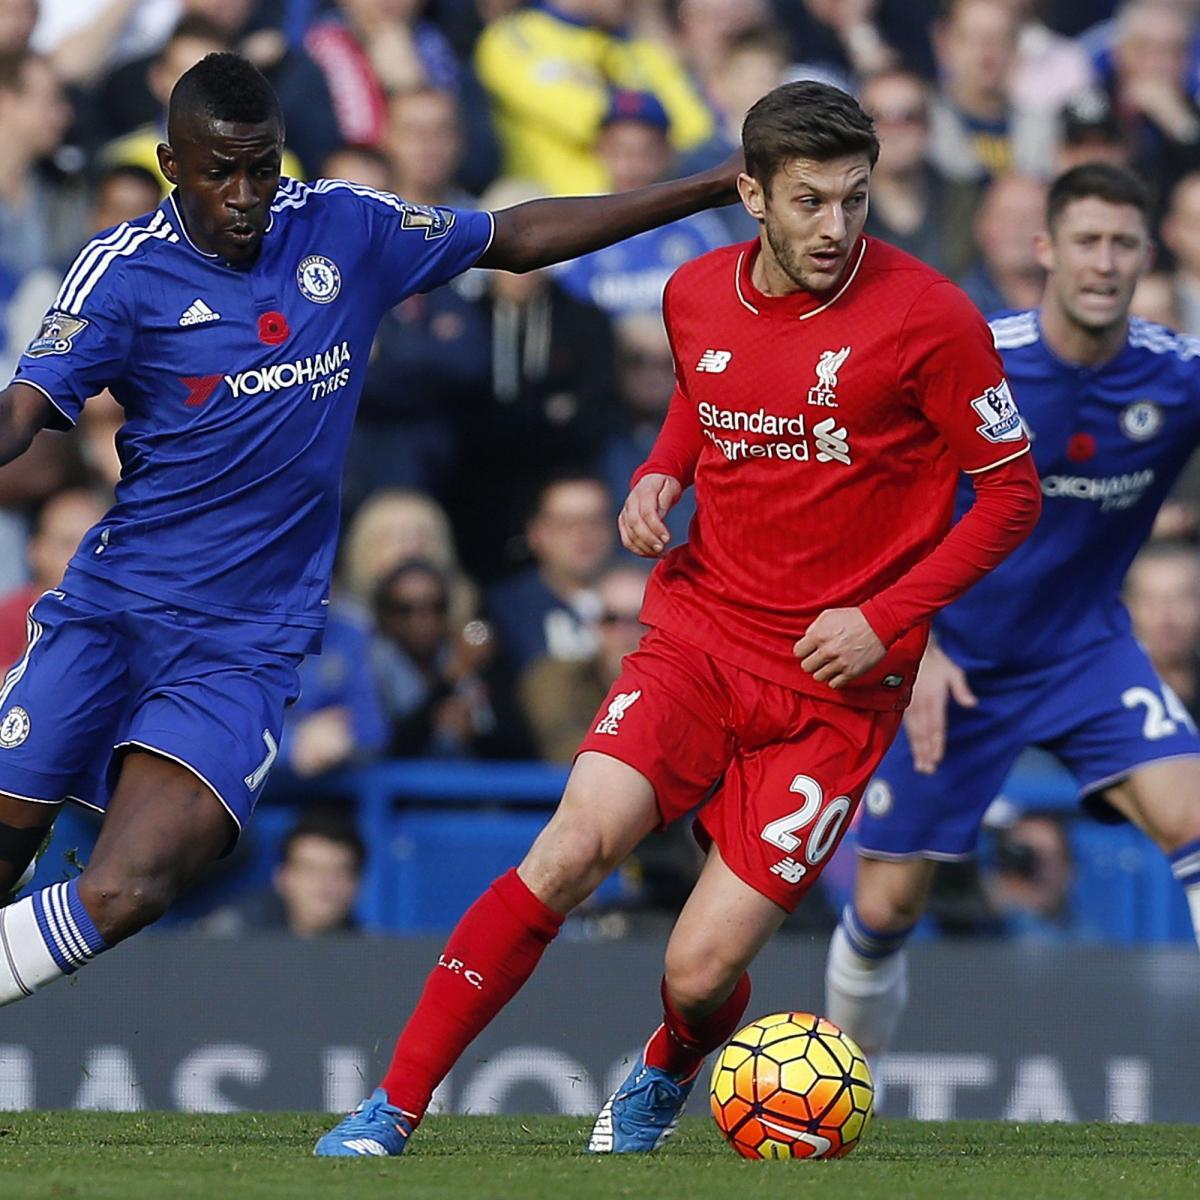 Live Streaming Soccer News Liverpool Vs Benfica Live: Liverpool Vs. Chelsea: Team News, Live Stream, TV Info